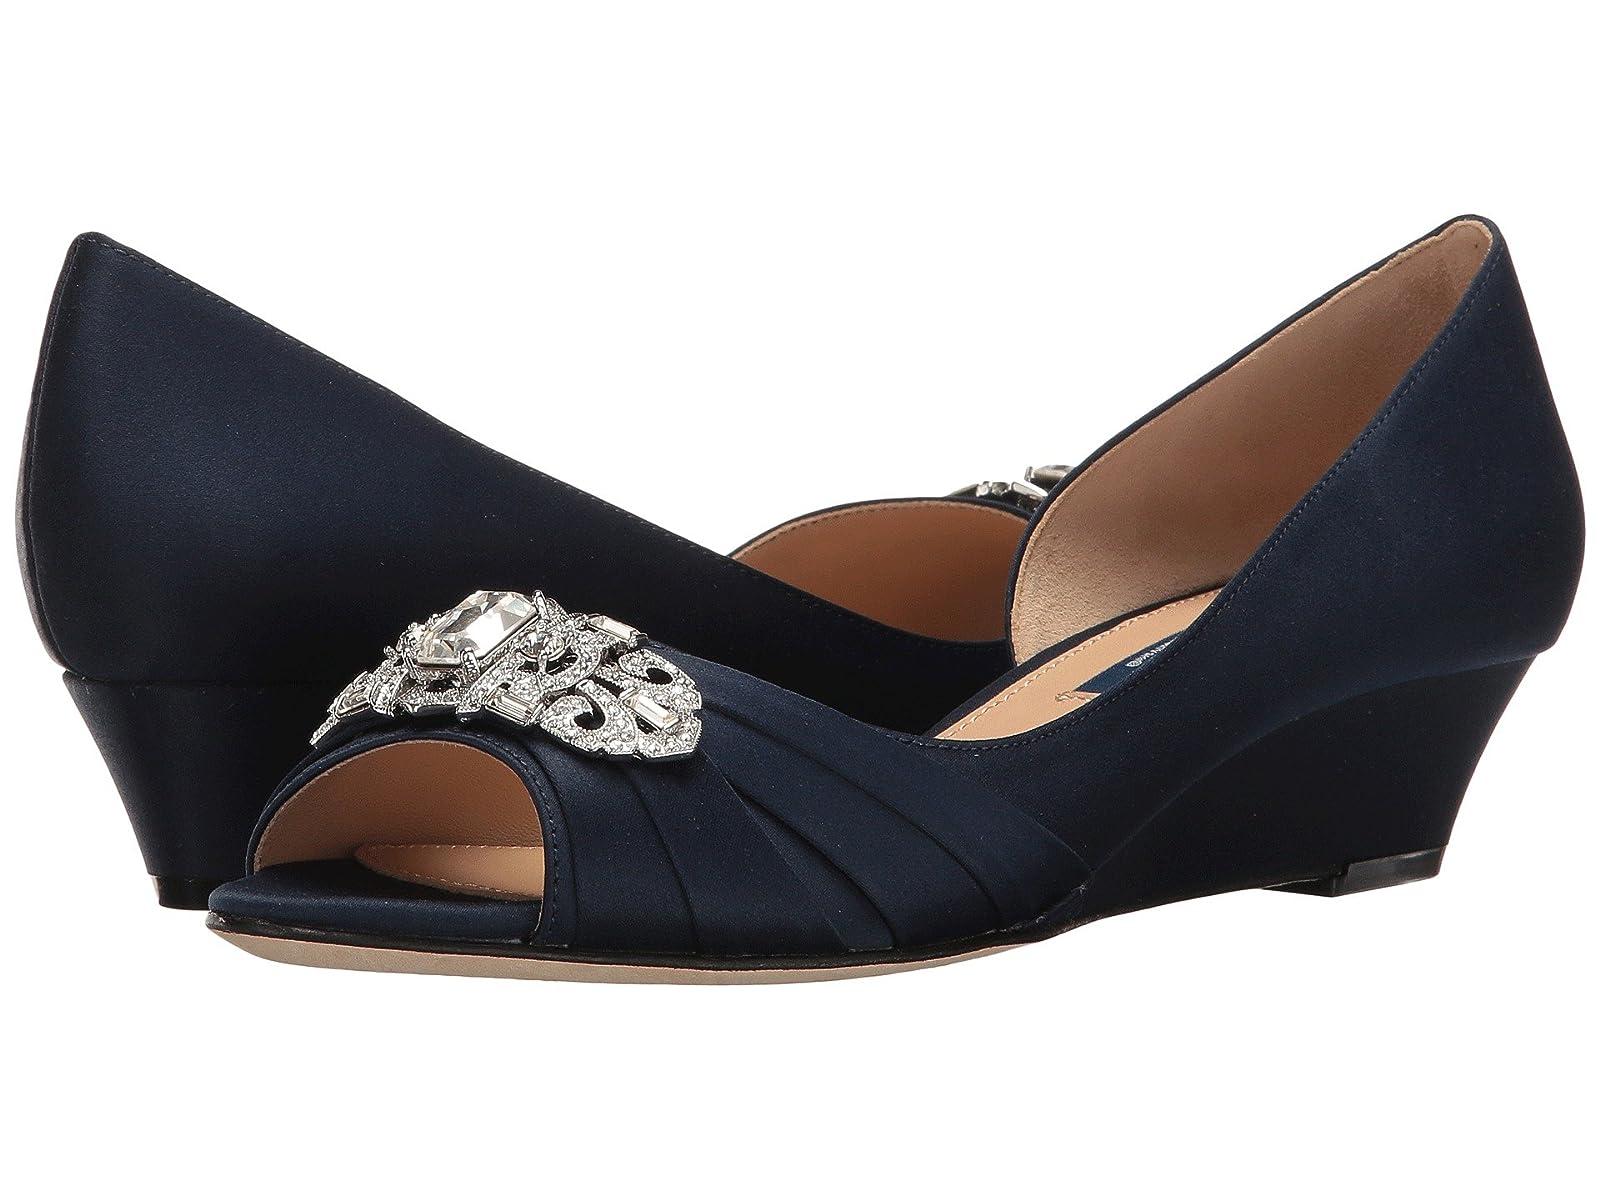 Nina RadhaCheap and distinctive eye-catching shoes